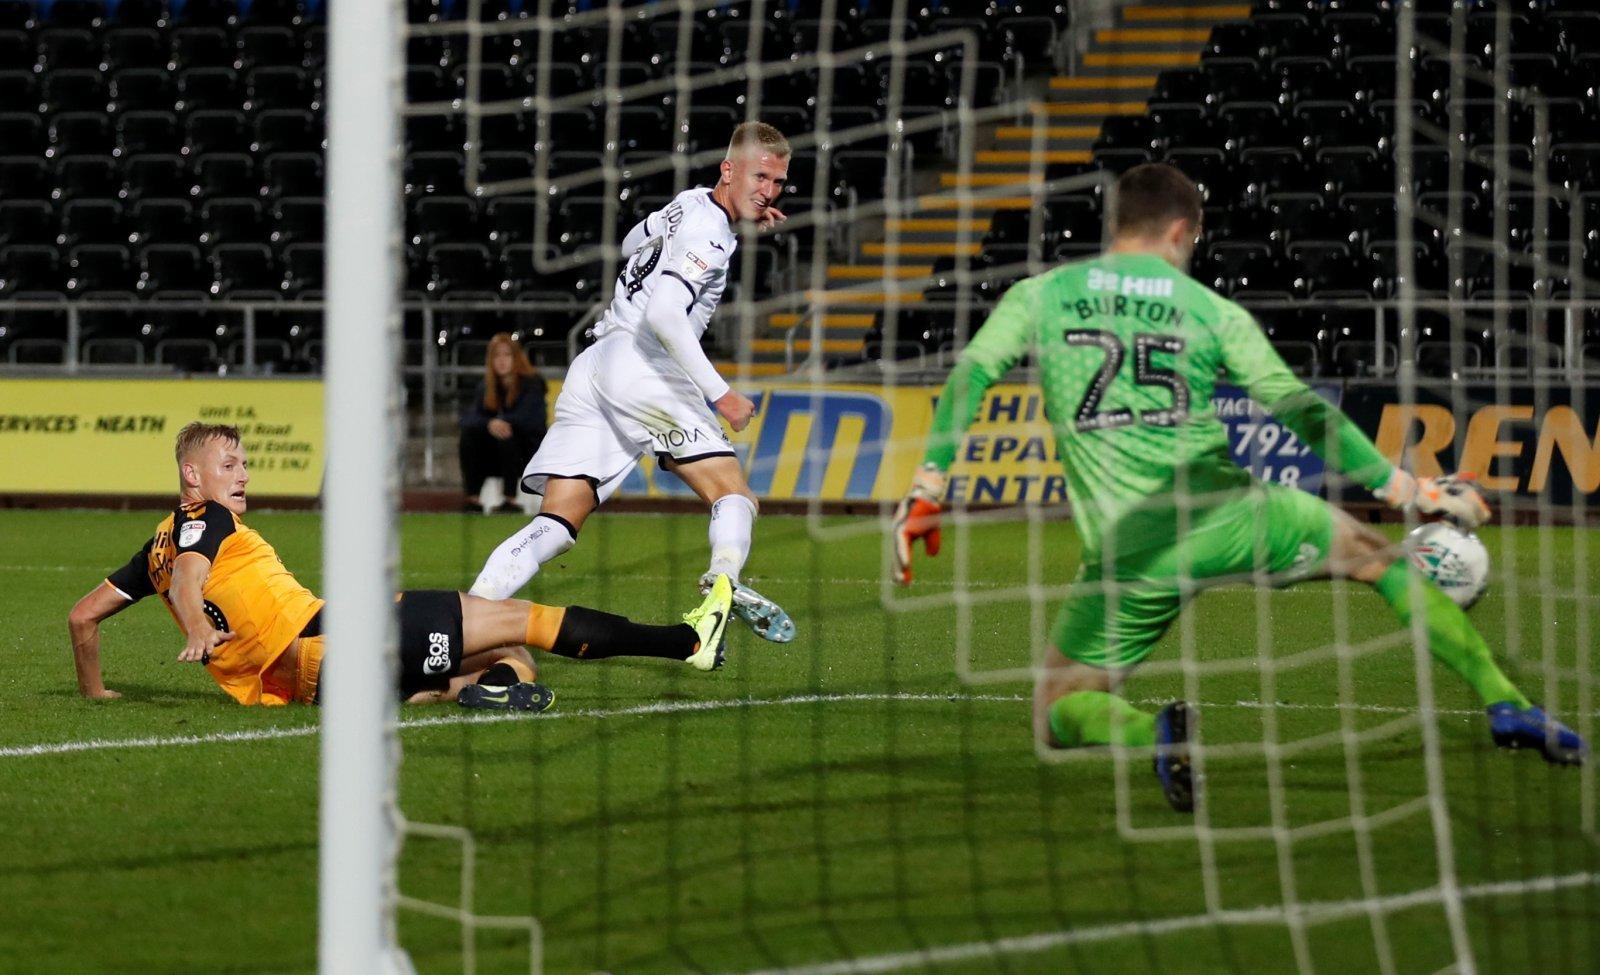 Swansea City vs Cambridge United Carabao Cup